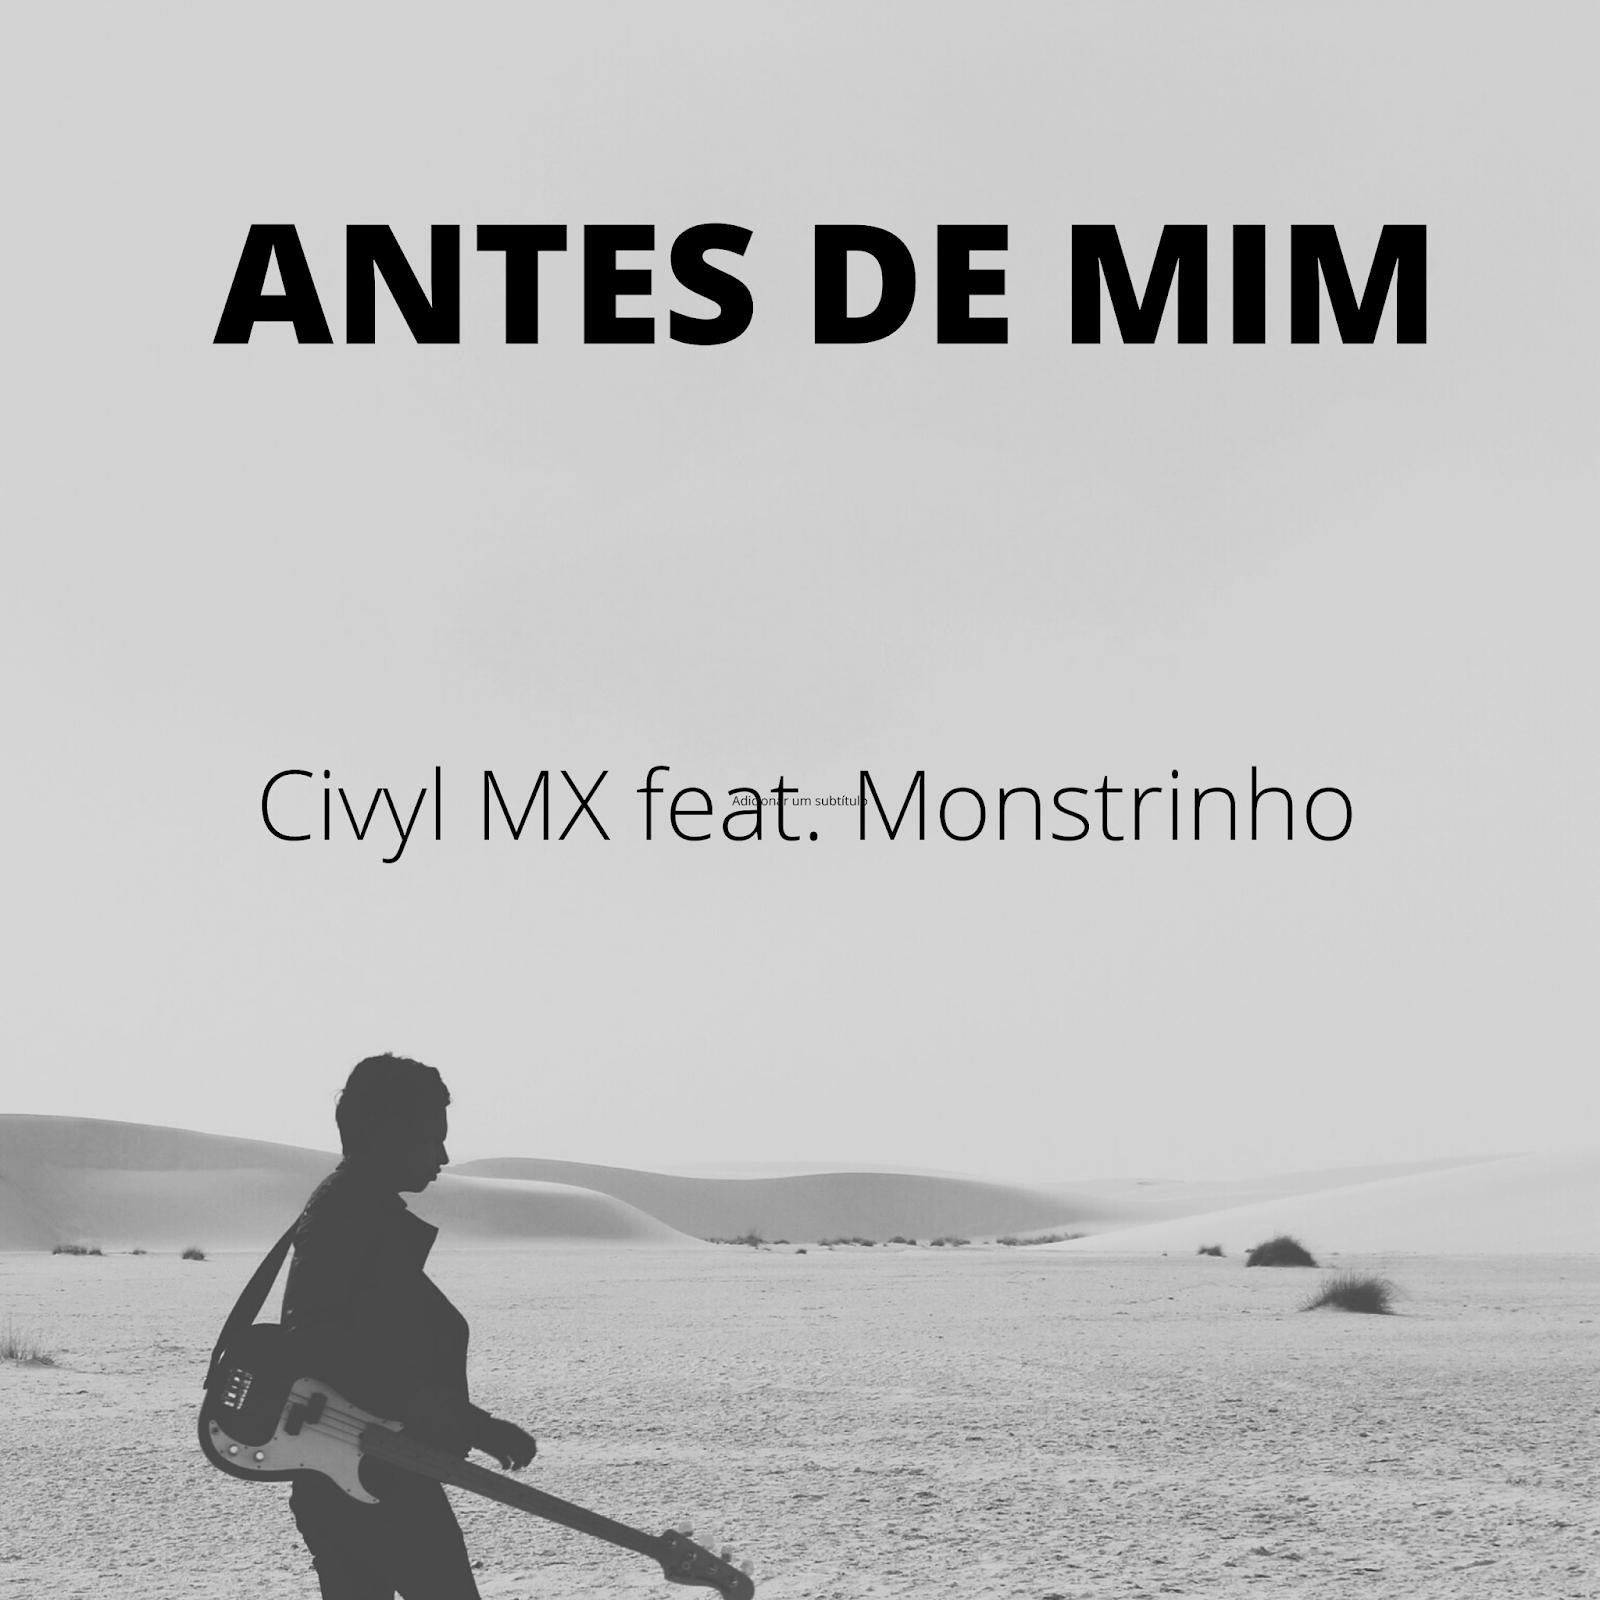 Civyl MX feat. Mateus Monstrinho - Antes de mim [MP3 DOWNLOAD]